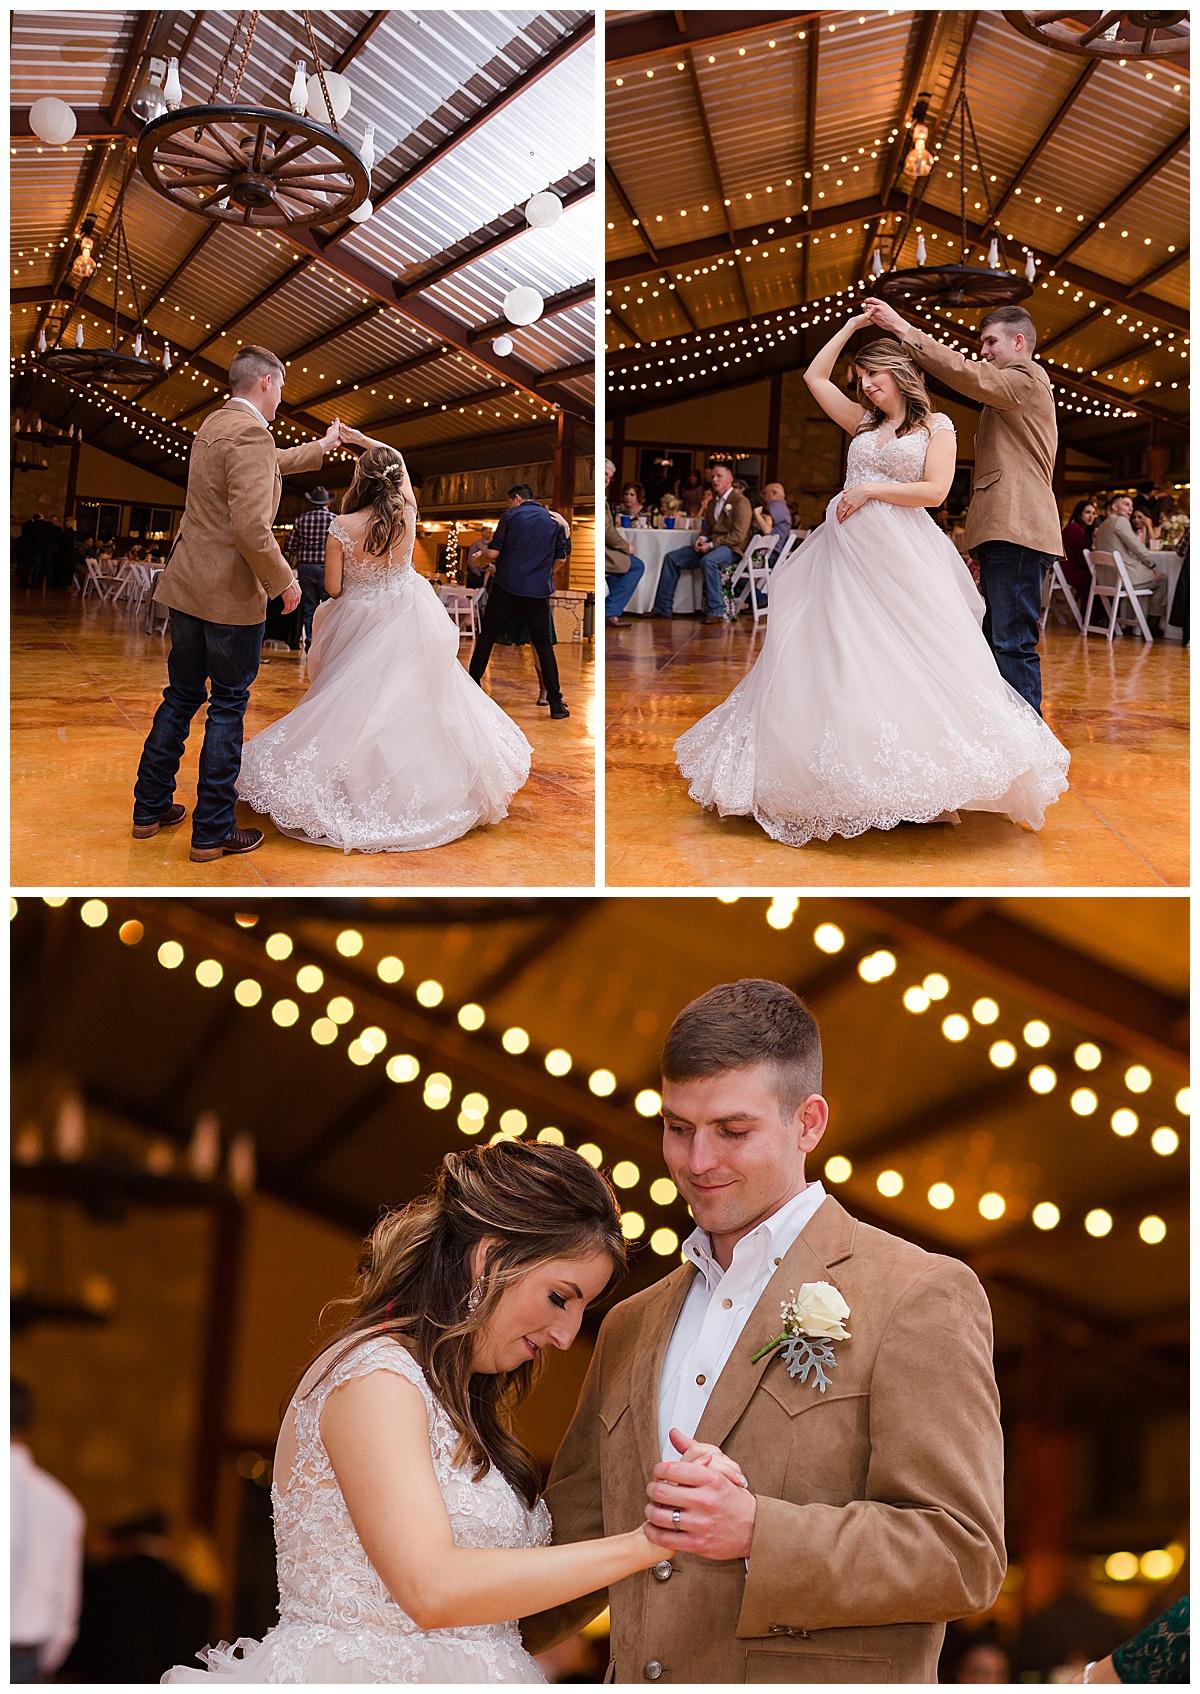 Wedding-Photographer-Texas-Hill-Country-Happy-H-Ranch-Comfor-Texas-Carly-Barton-Photography_0082.jpg